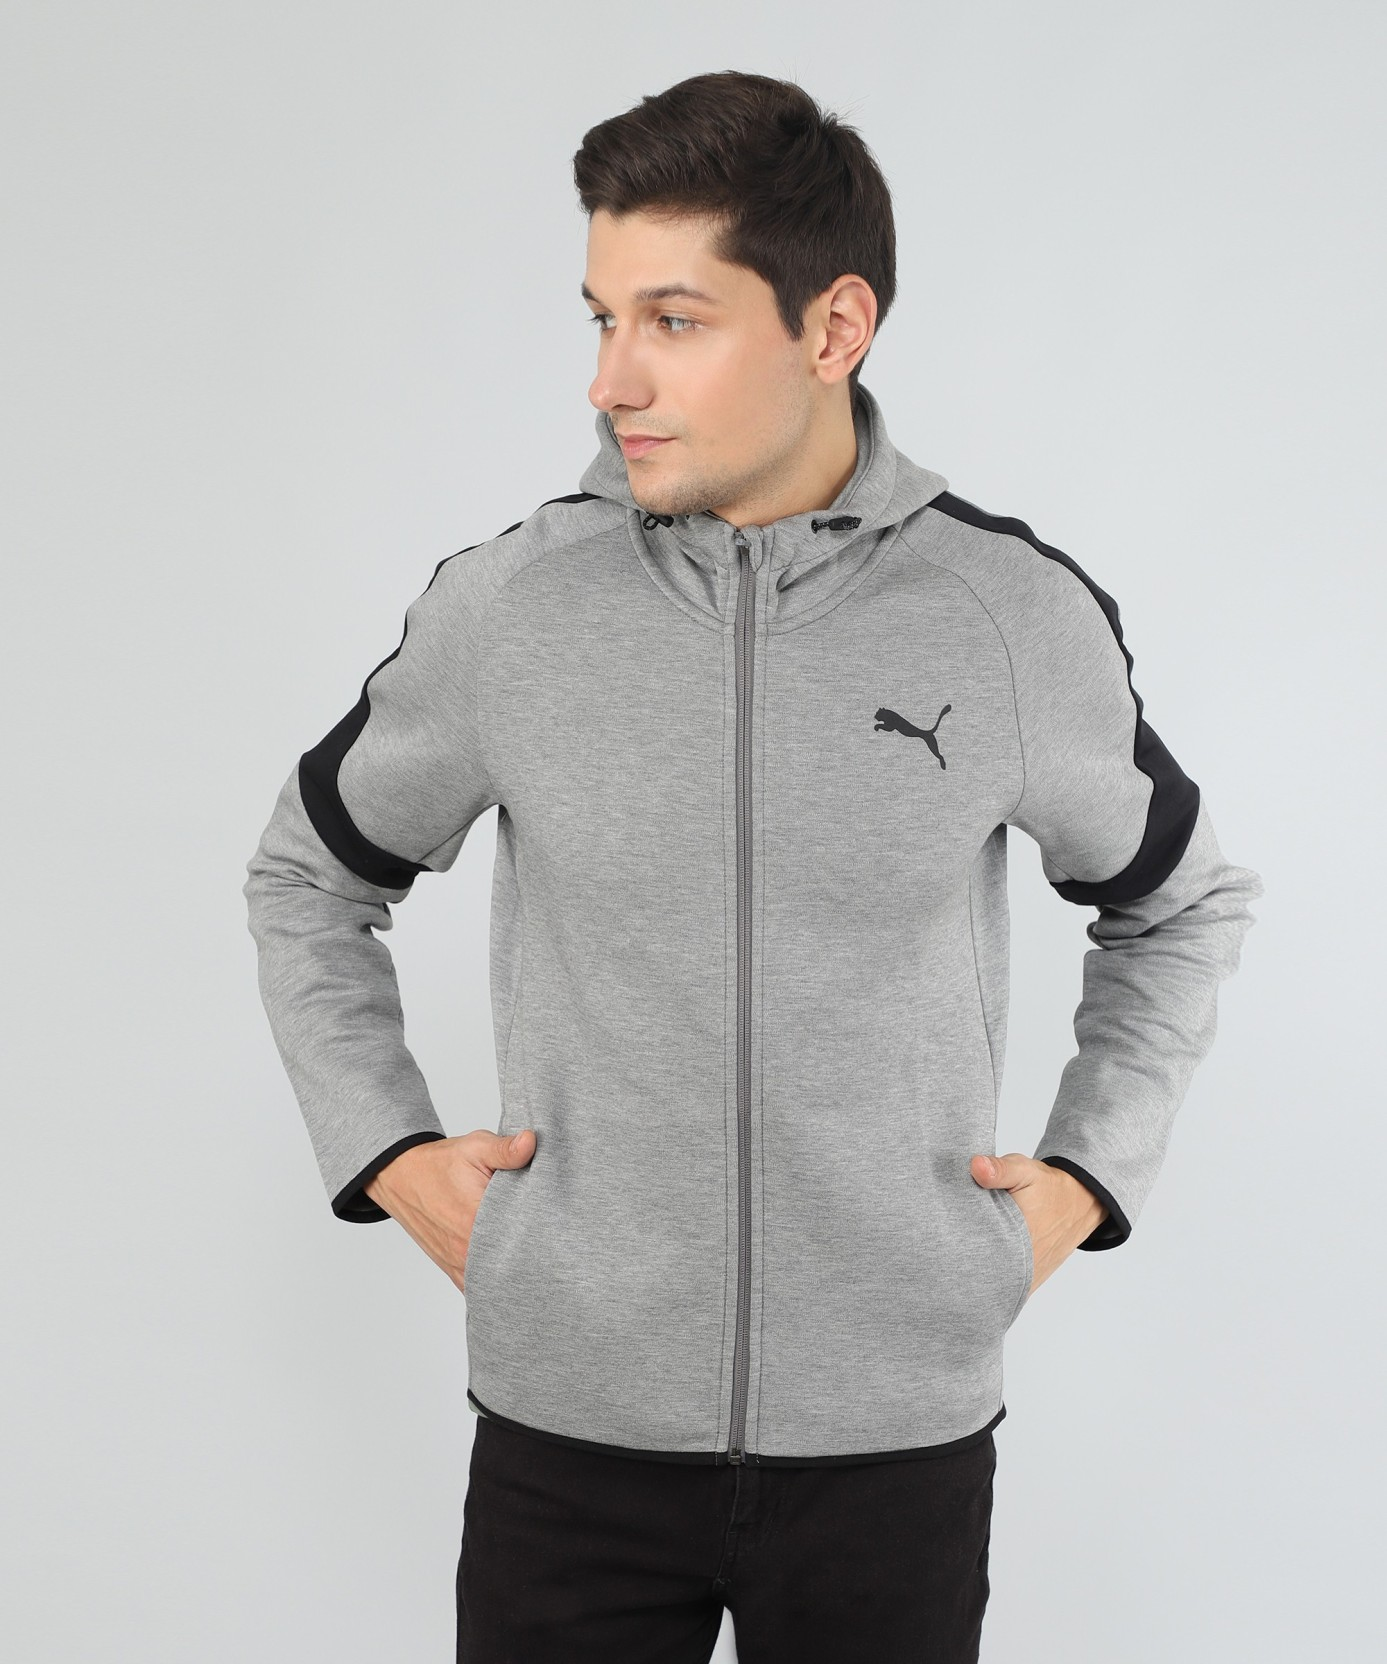 1f95b7593ca0 Puma Sweatshirts Online India - Cotswold Hire